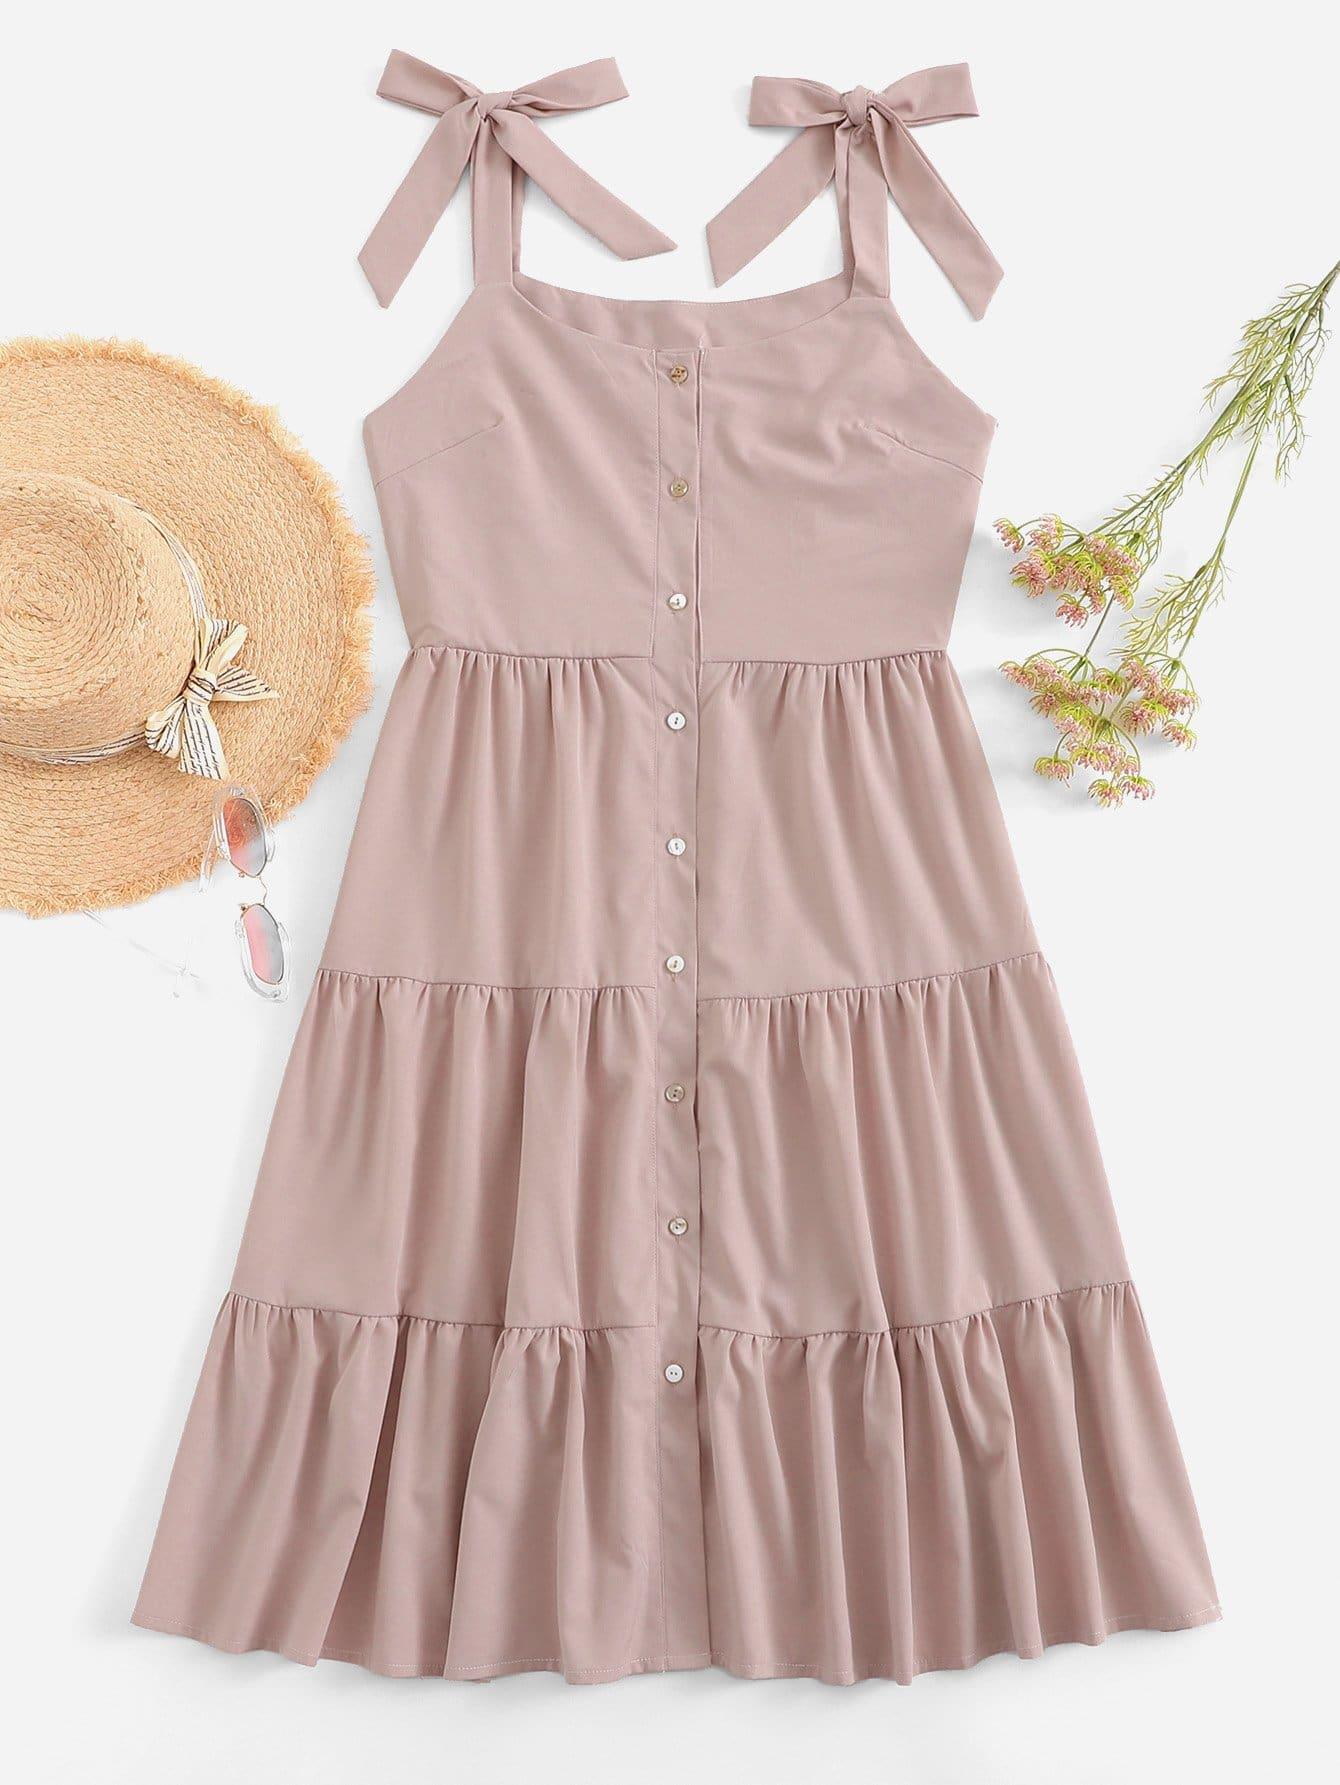 Tie Shoulder Solid Dress